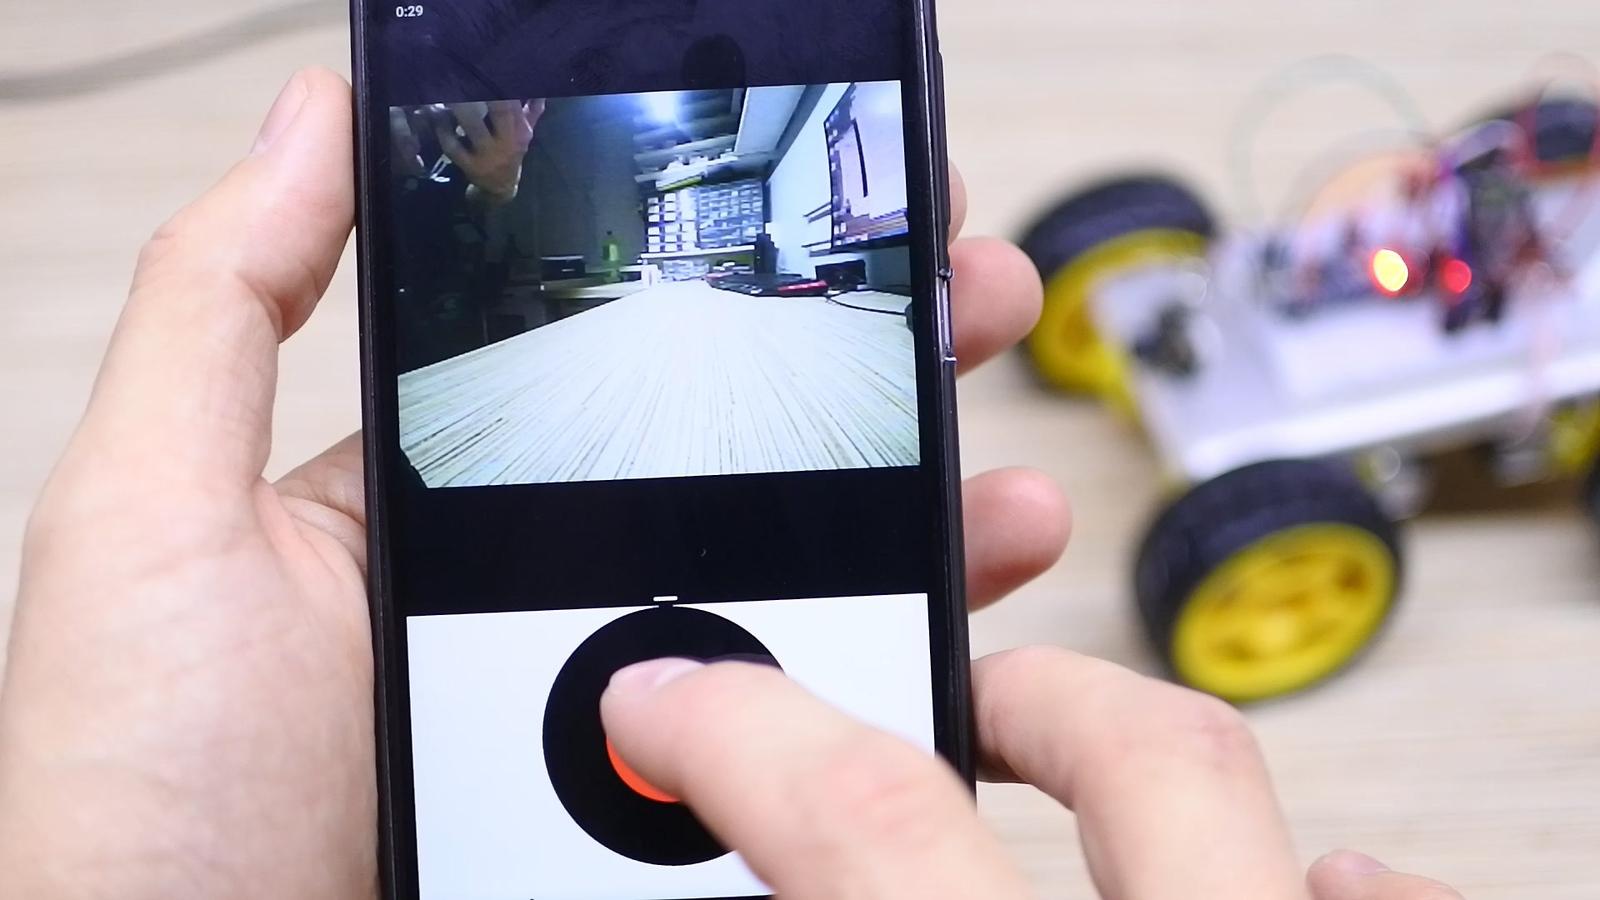 Камера с дисплеем своими руками фото 812